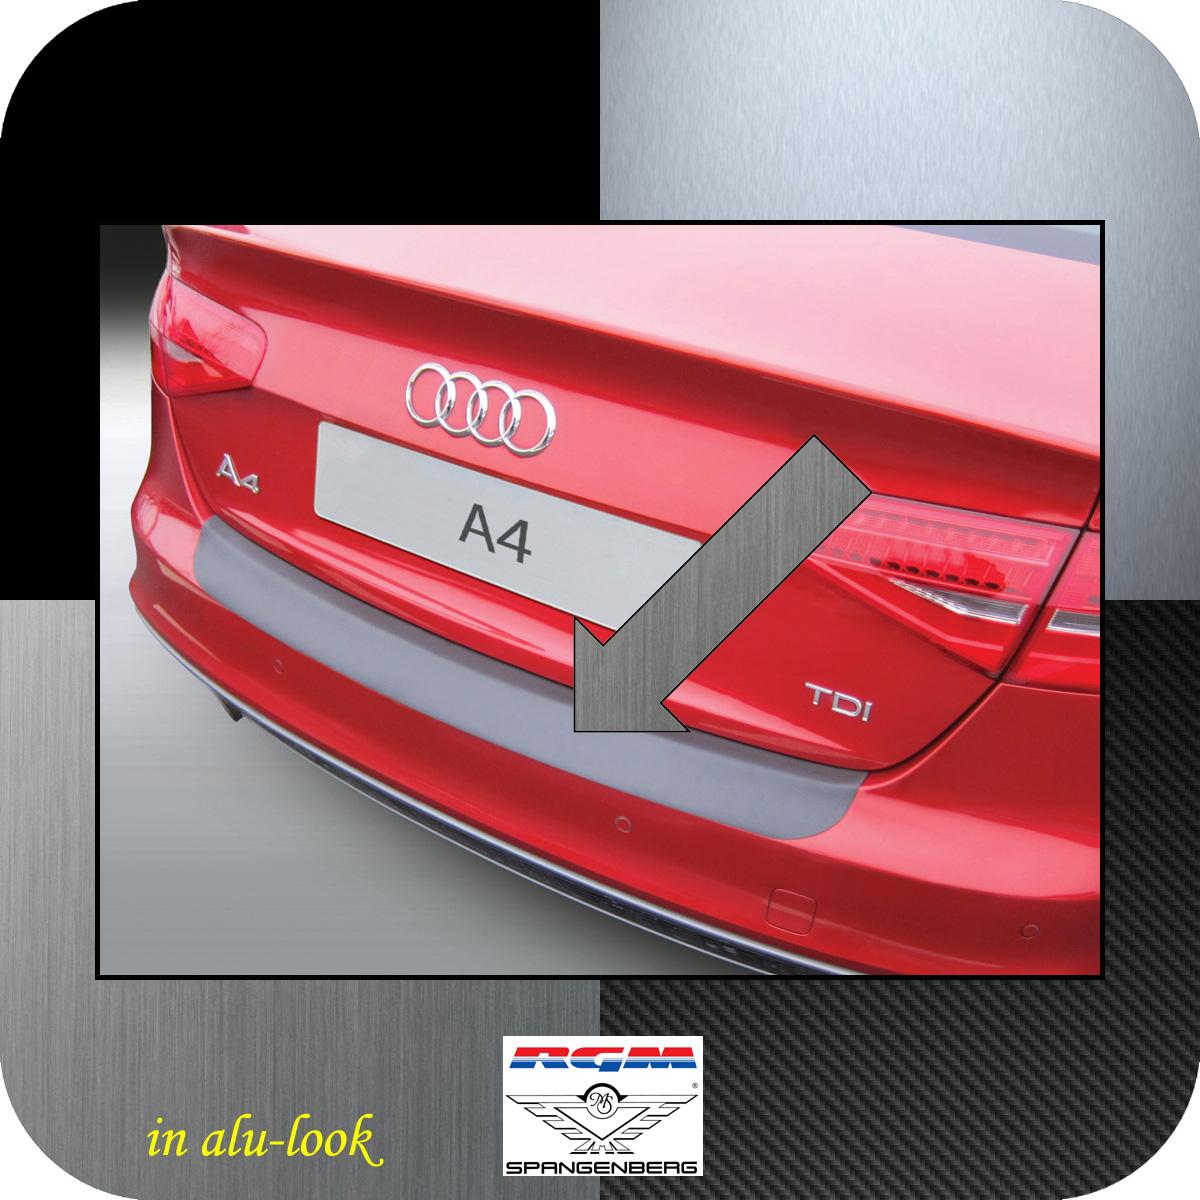 Ladekantenschutz Alu-Look Audi A4 B8 Limousine facelift 2012-2015 3504905